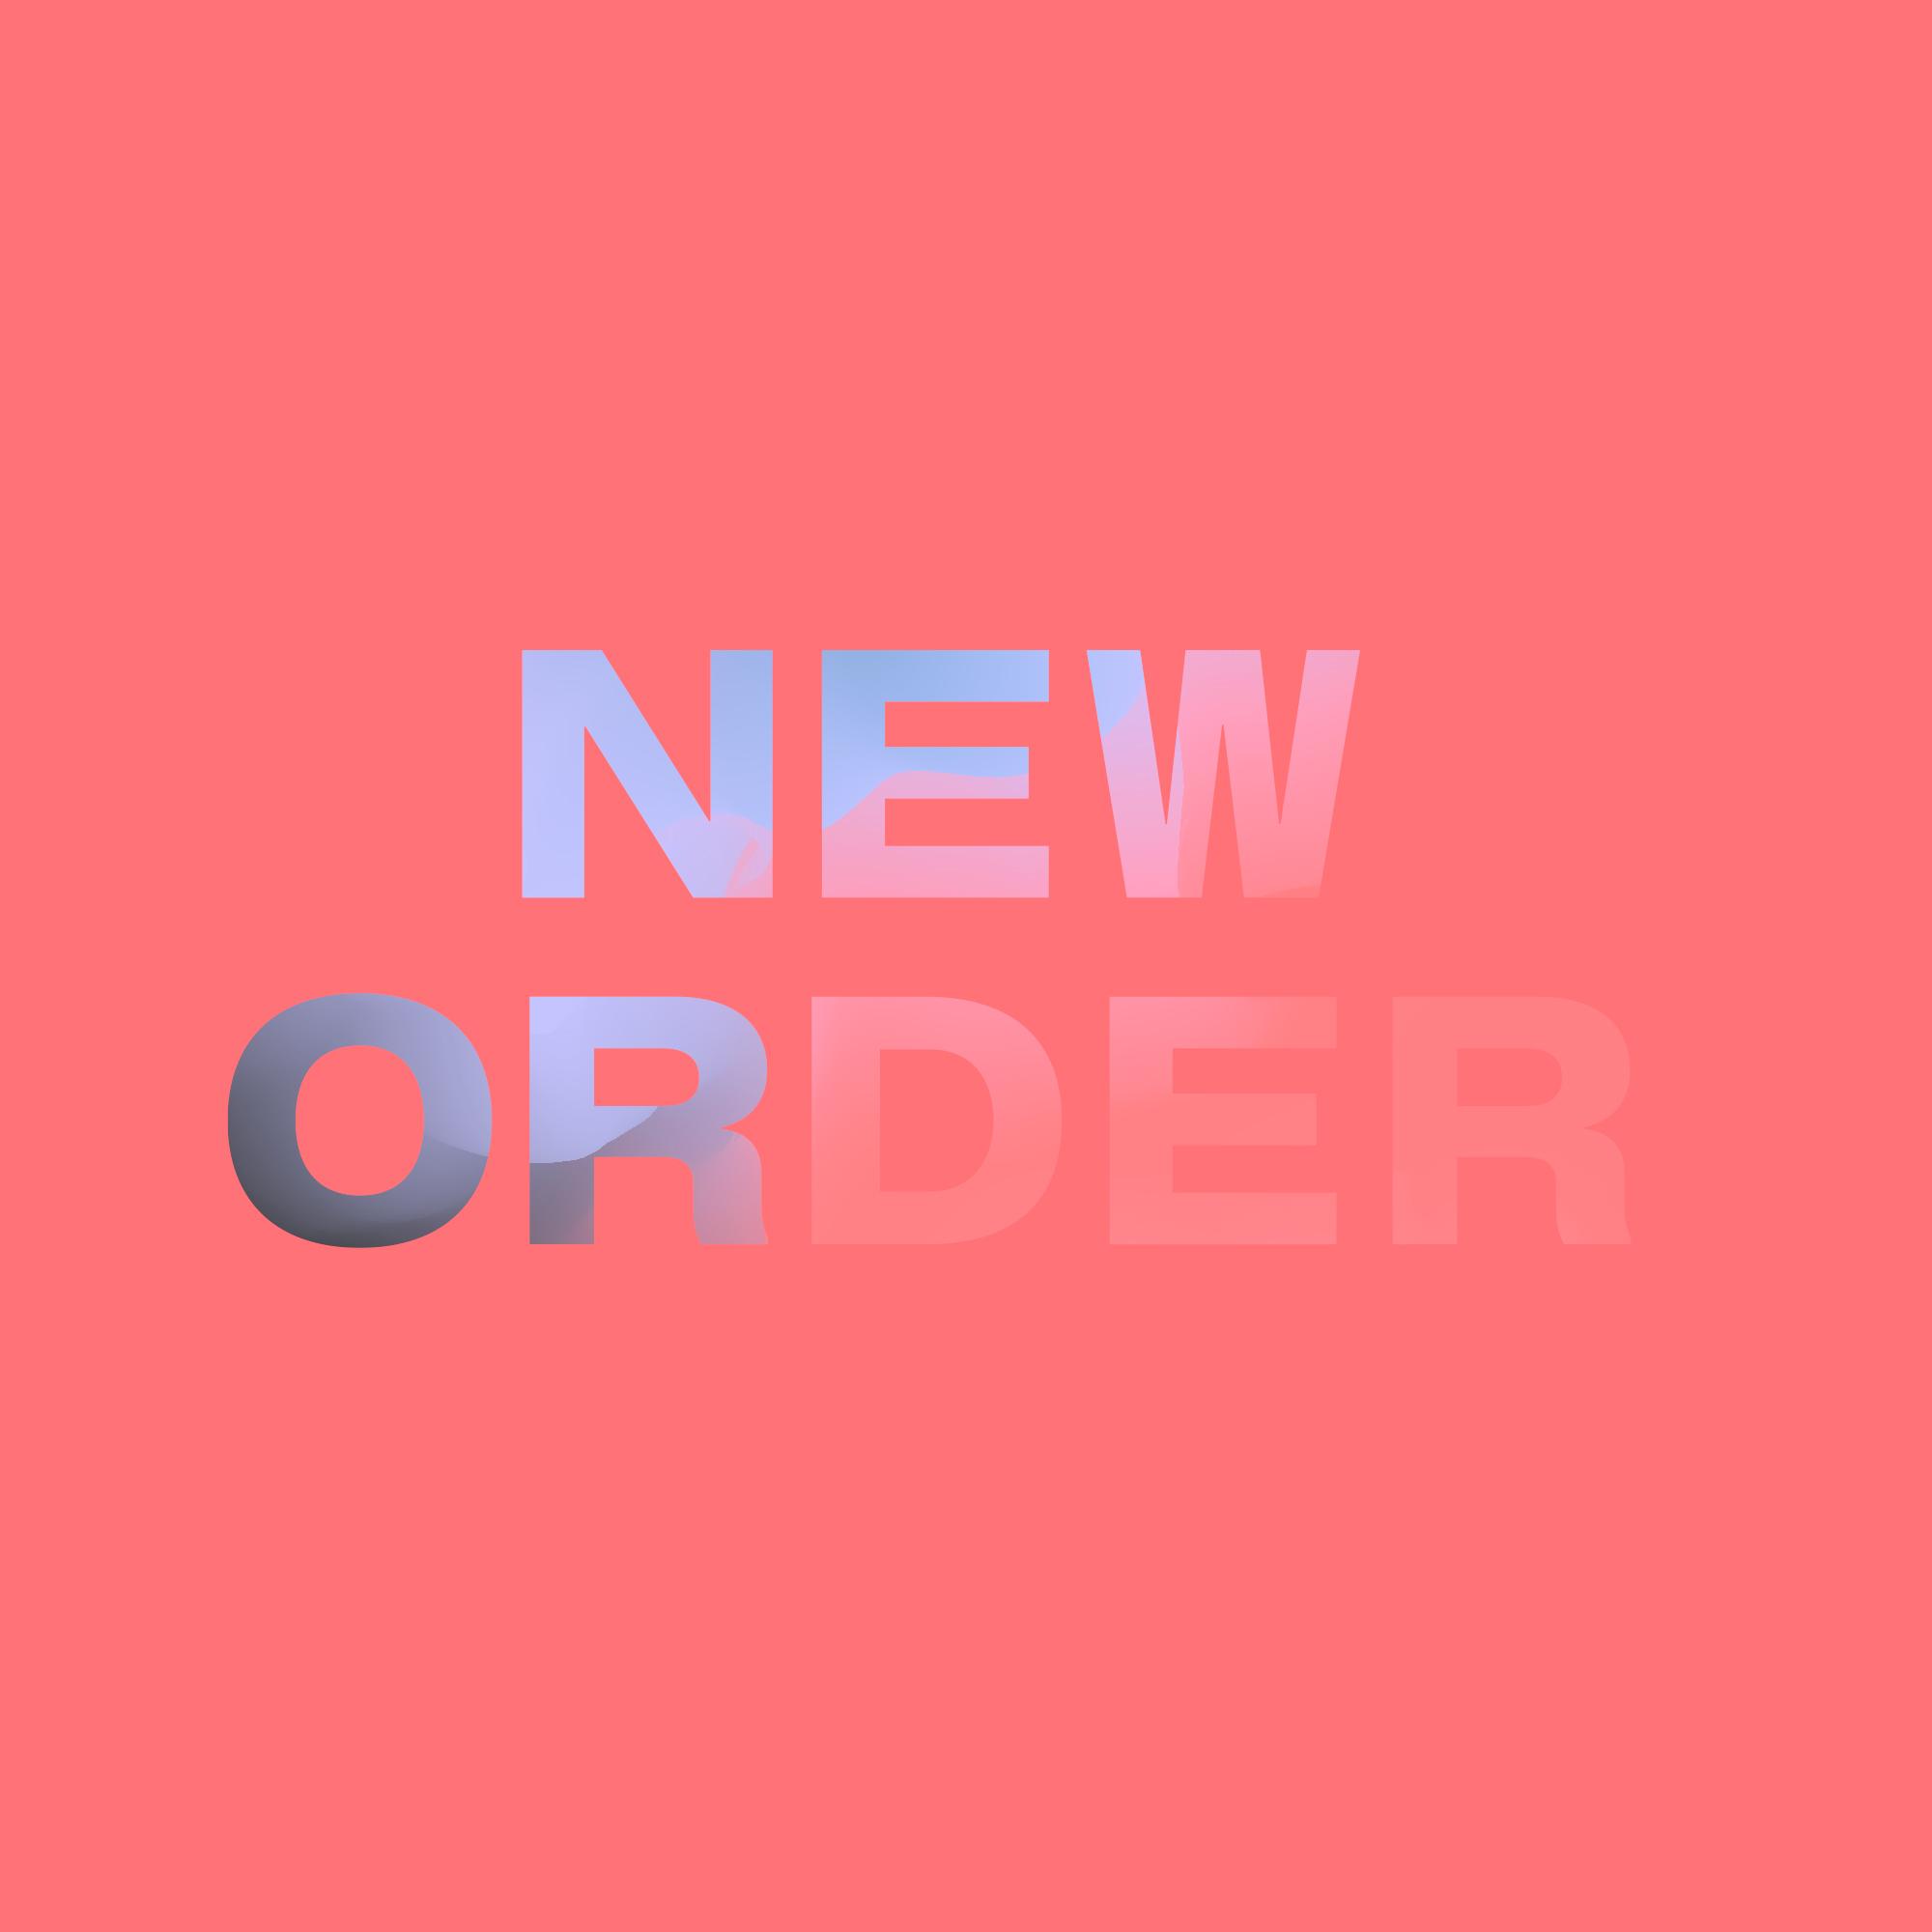 New Order Visual Identity designed by Tobias Heumann